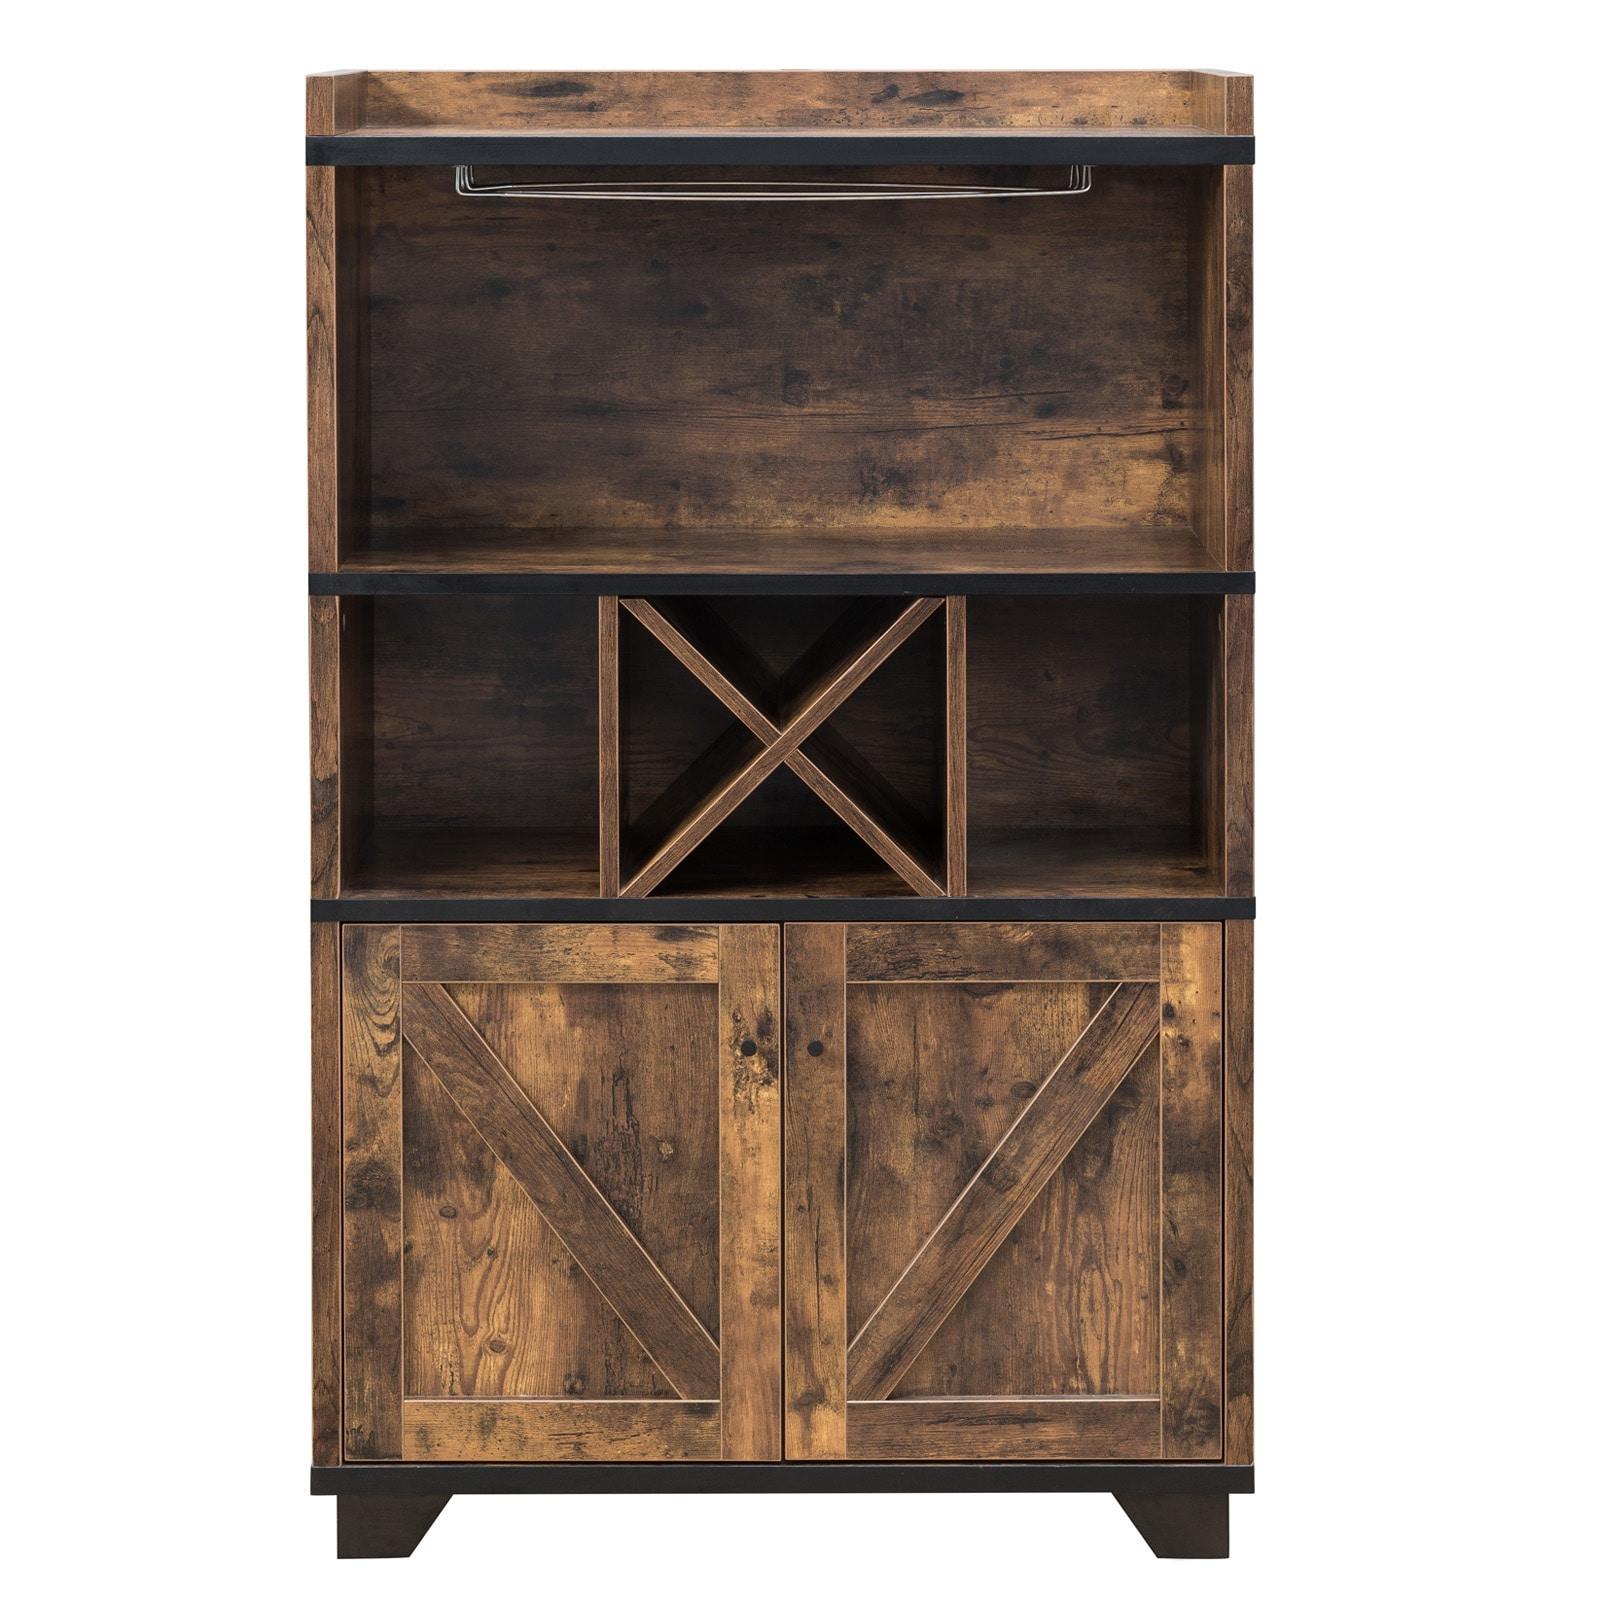 Furniture of America Wesleyan Rustic Farmhouse Wine Cabinet Buffet